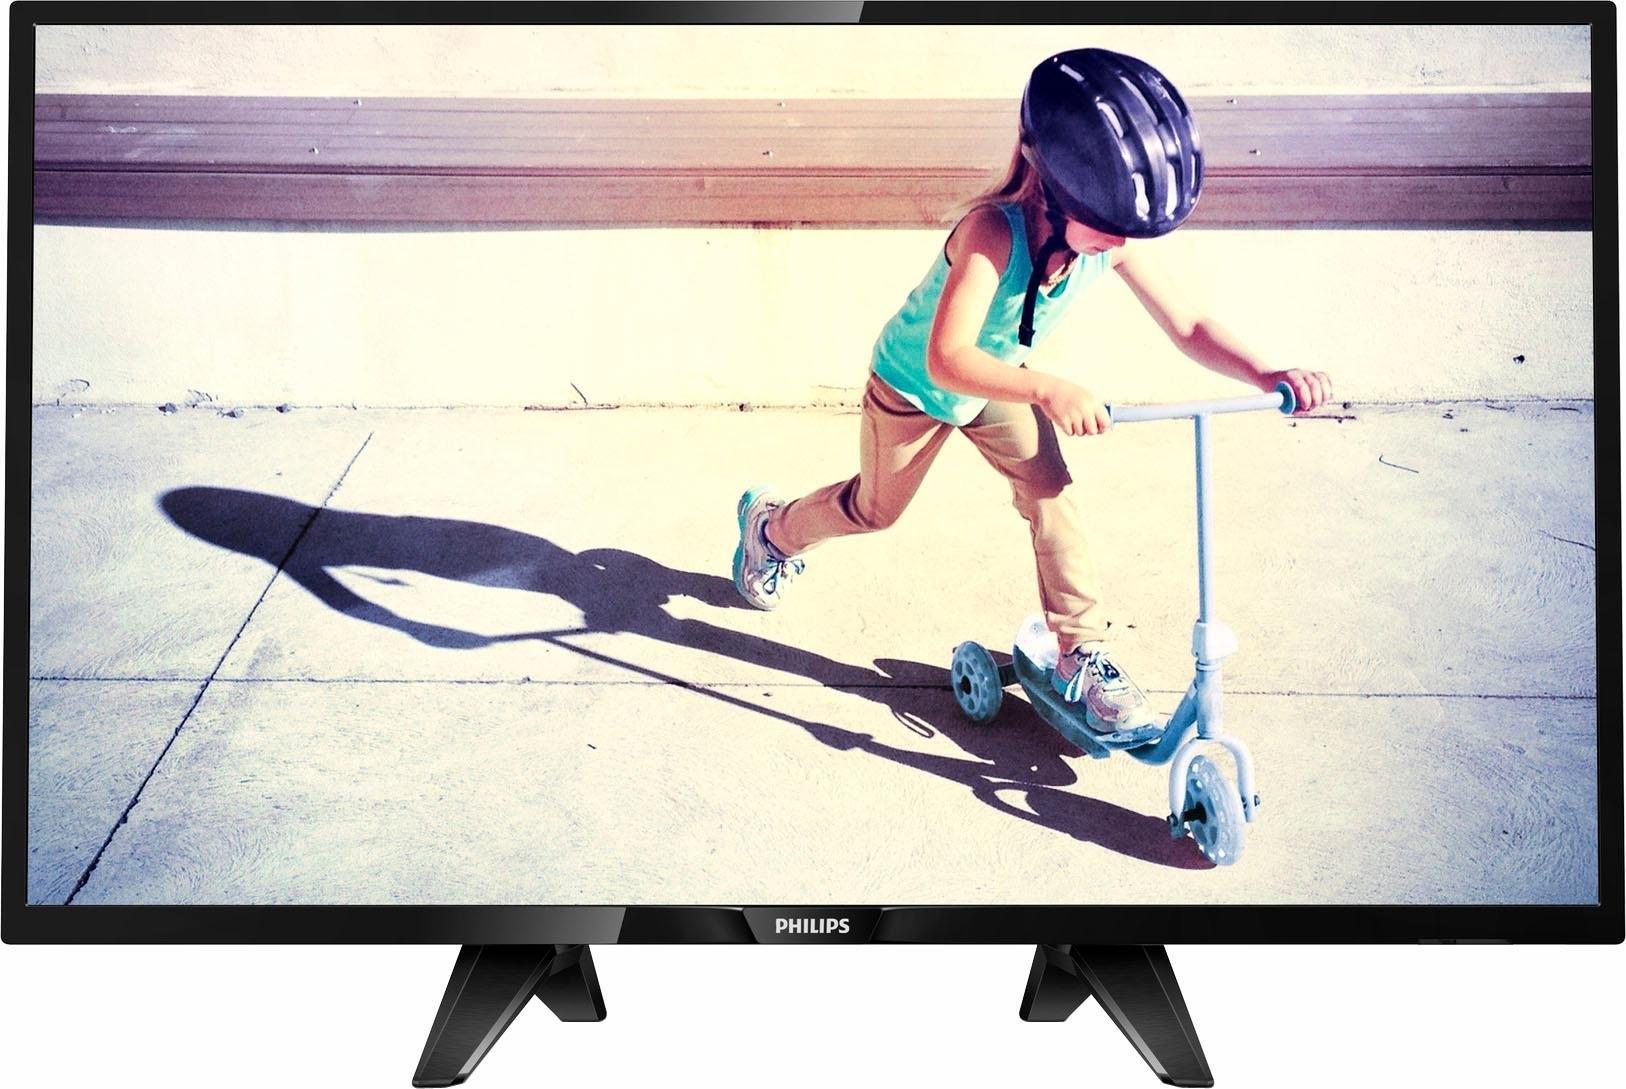 Philips 32PFS4132/12 LED-TV (80 cm / (32 inch)), Full HD voordelig en veilig online kopen